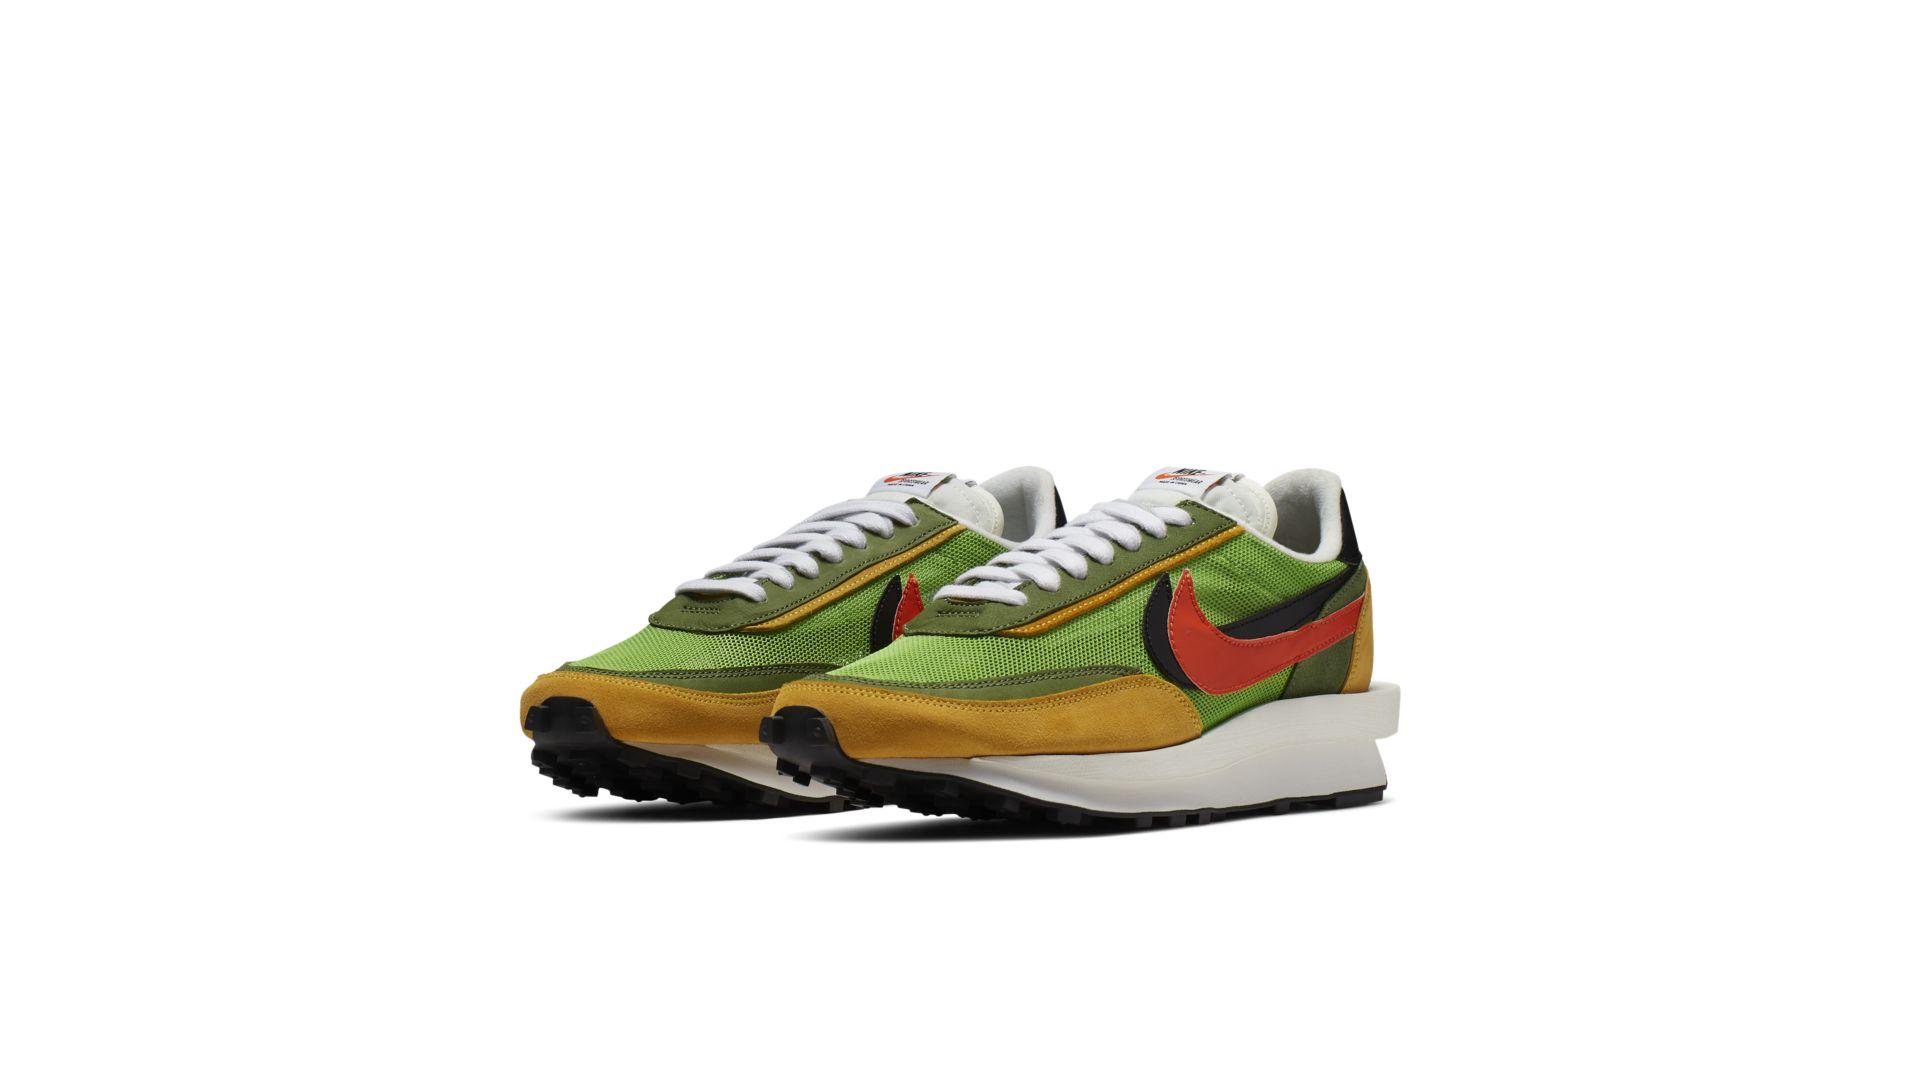 Sacai X Nike LDV Waffle 'Green' (BV0073-300)